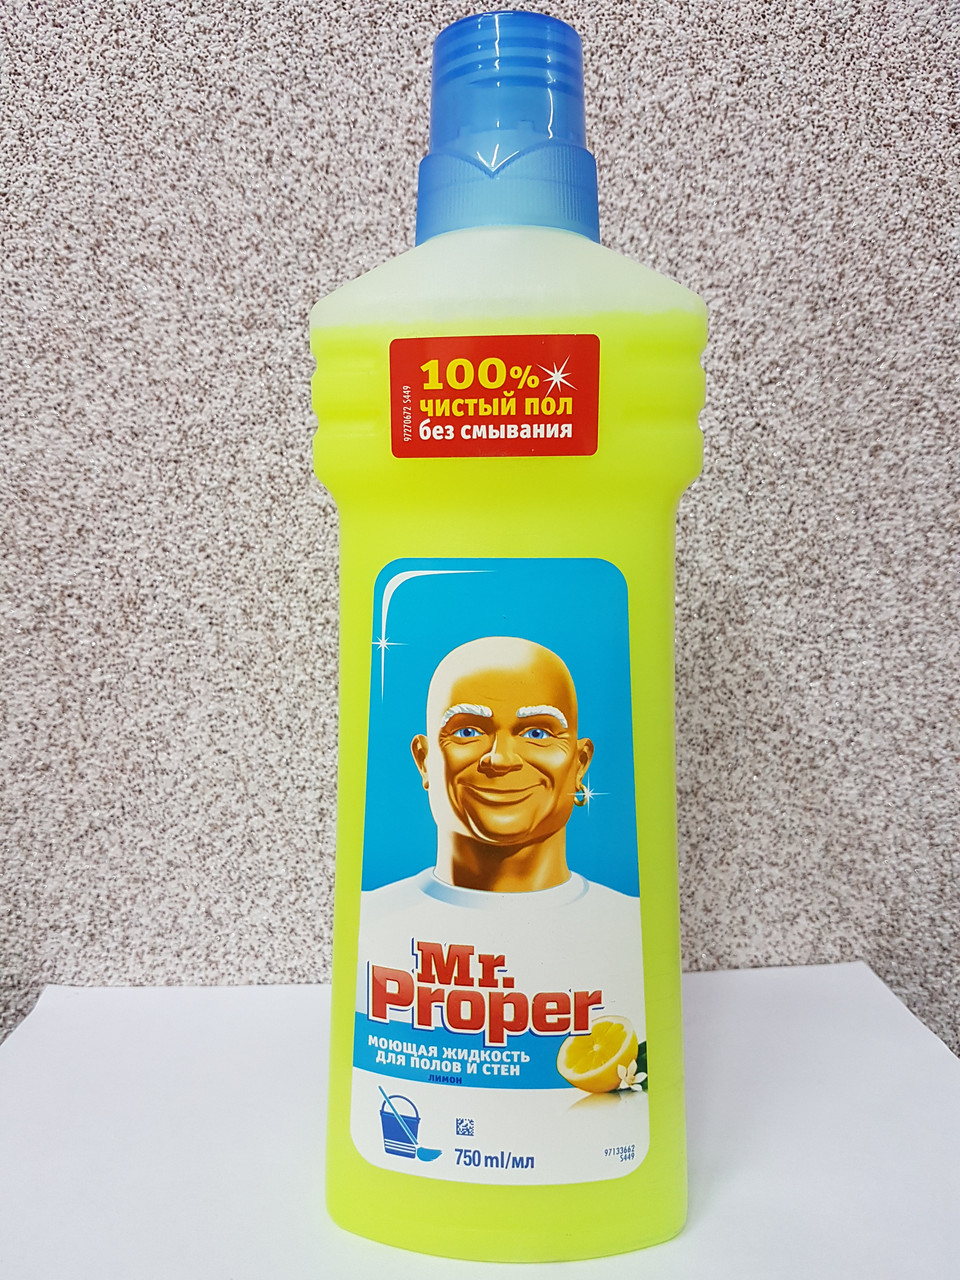 Мистер Пропер для полов и стен лимон, 750 мл